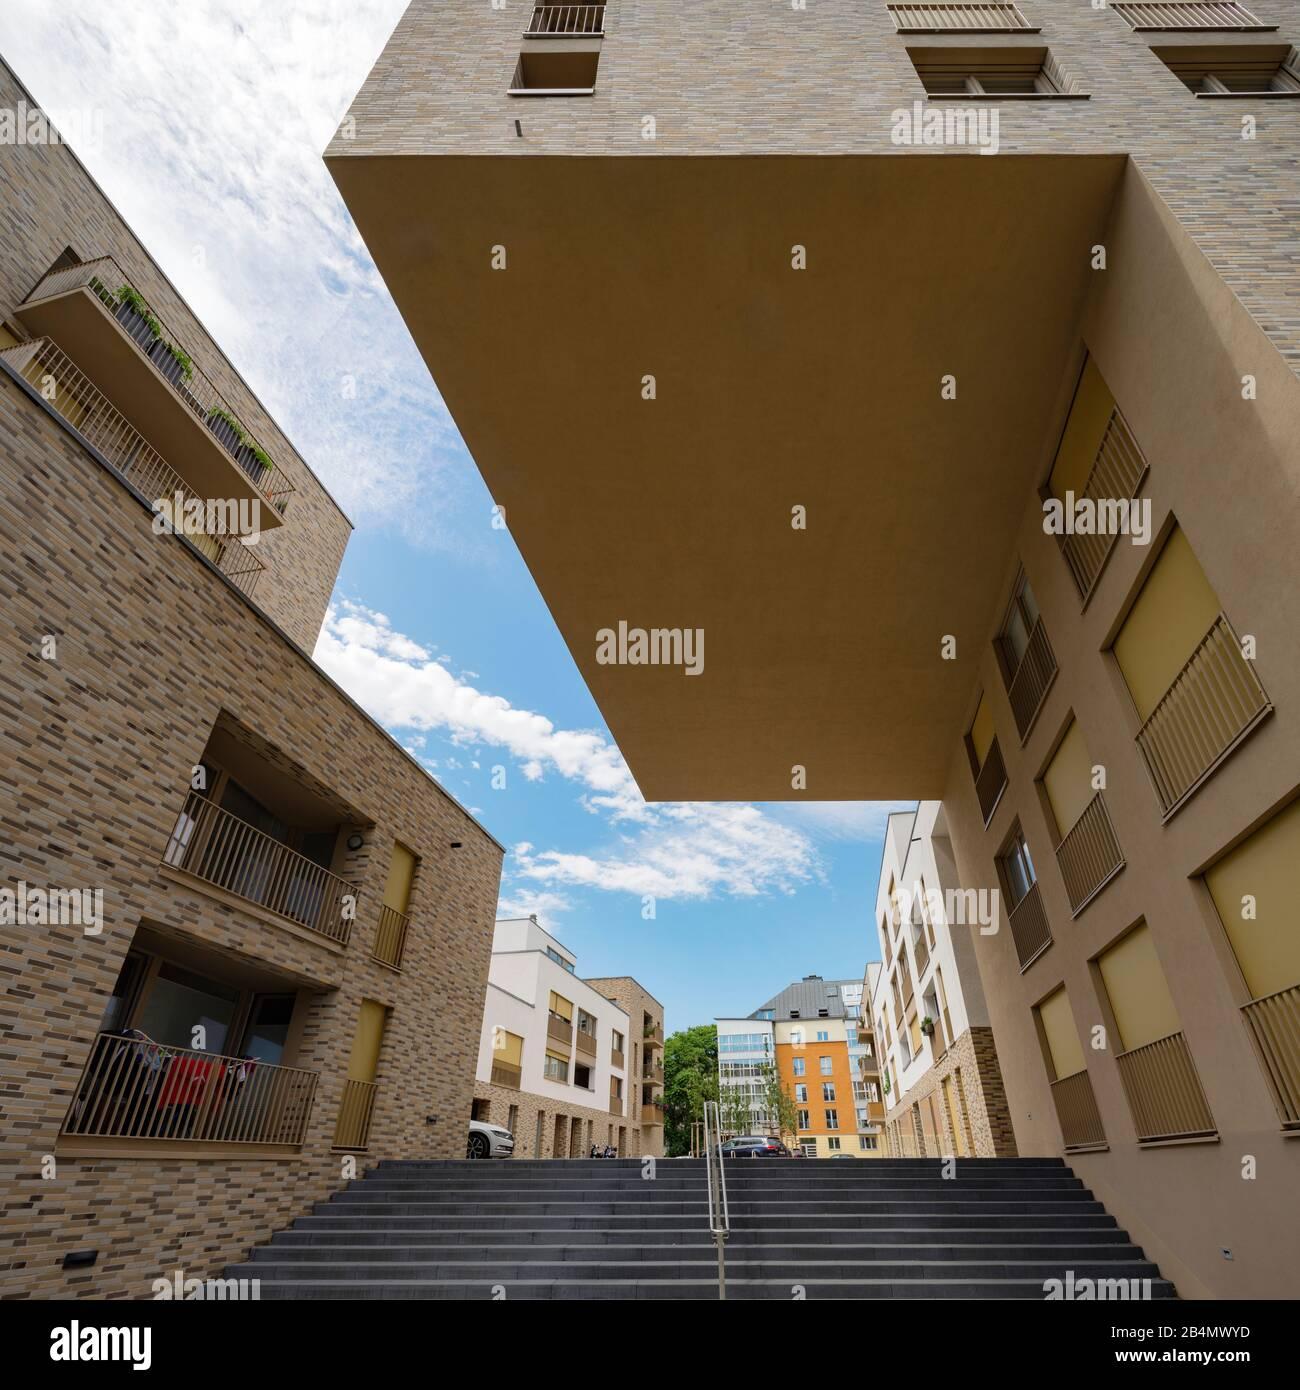 Germany, Saxony, Leipzig, modern residential district, gentrification, Plagwitz district Stock Photo